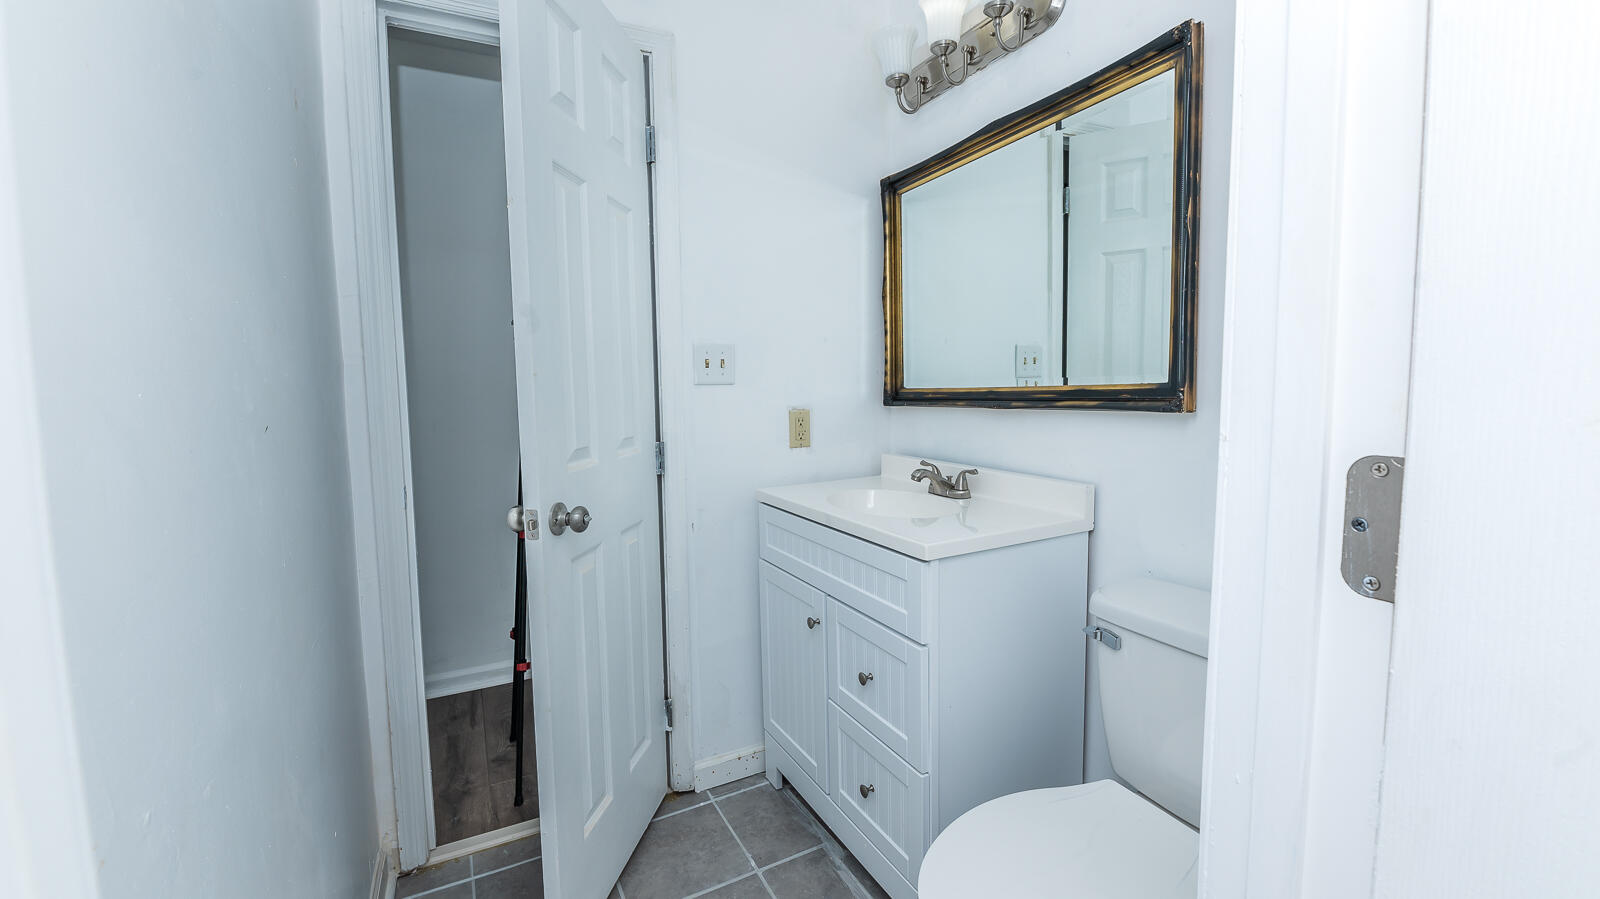 Ashley Villas Homes For Sale - 4315 Briarstone, North Charleston, SC - 19